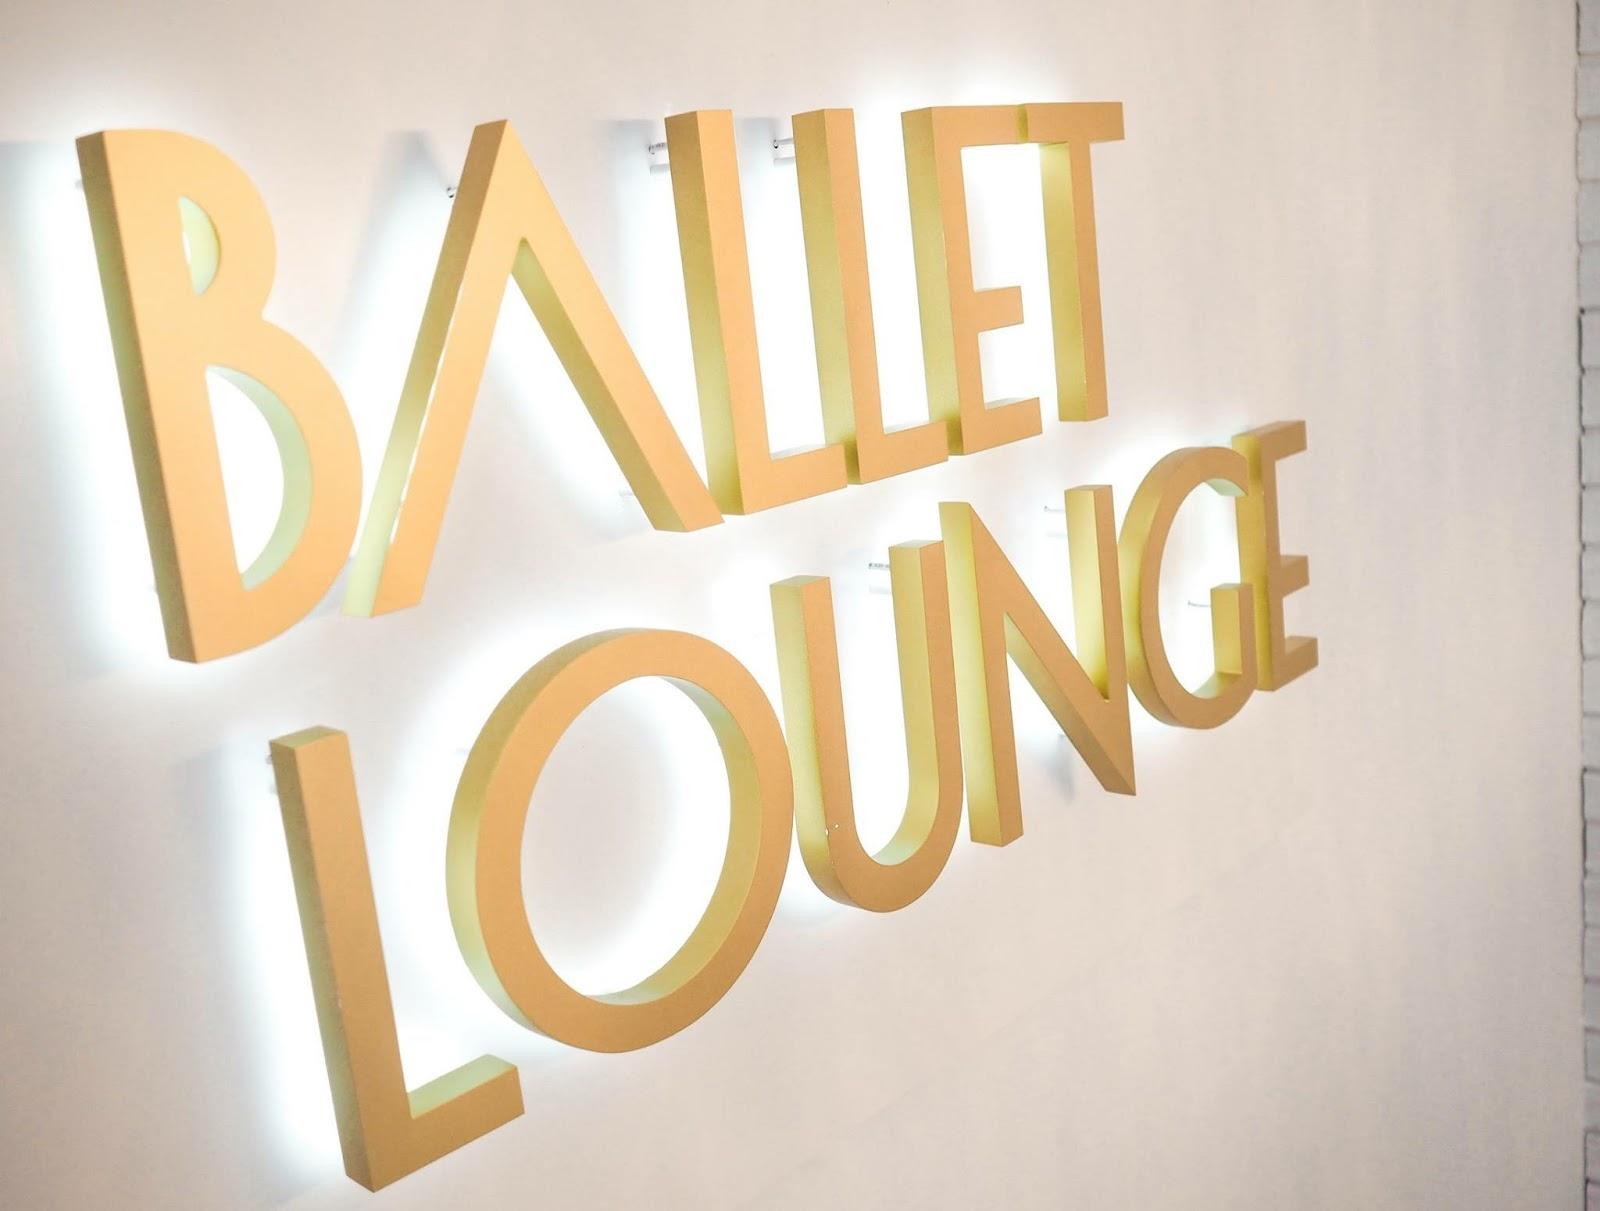 Ballet lounge sign.jpg